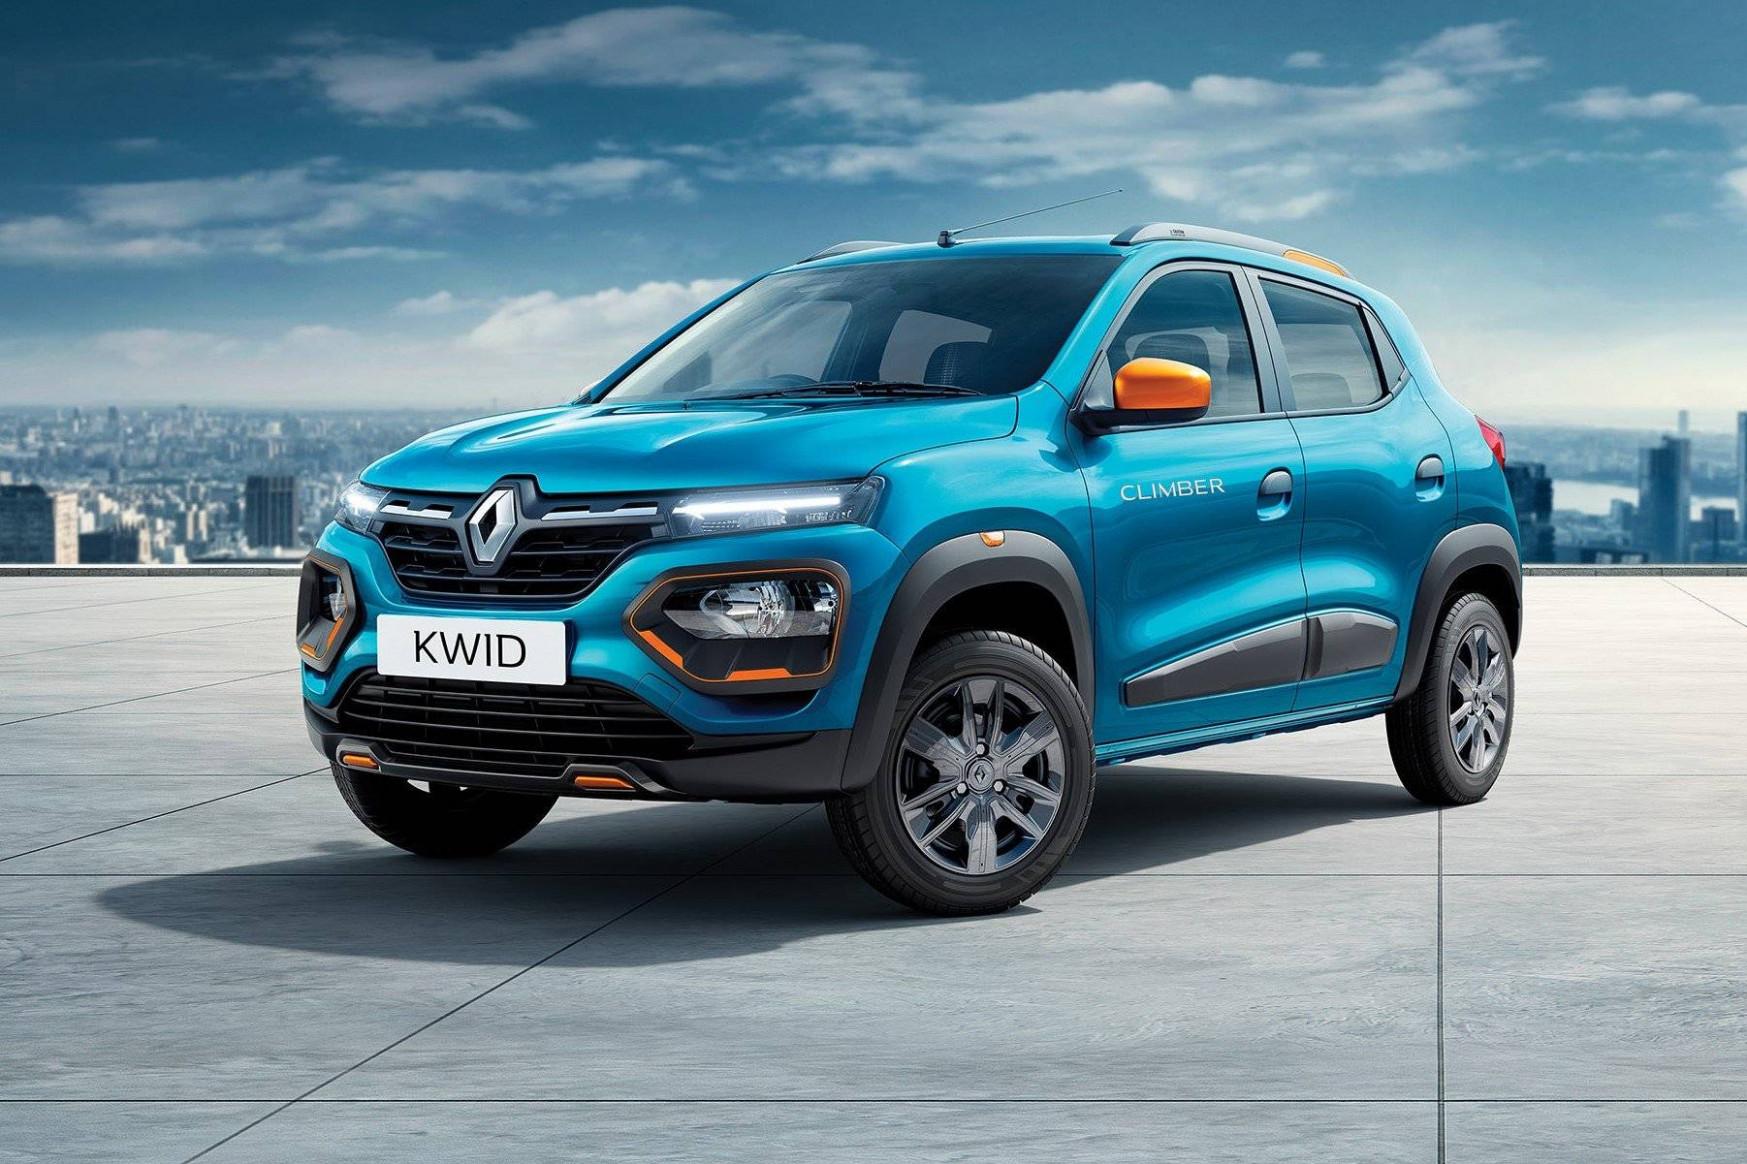 Release 2022 Renault Kwid